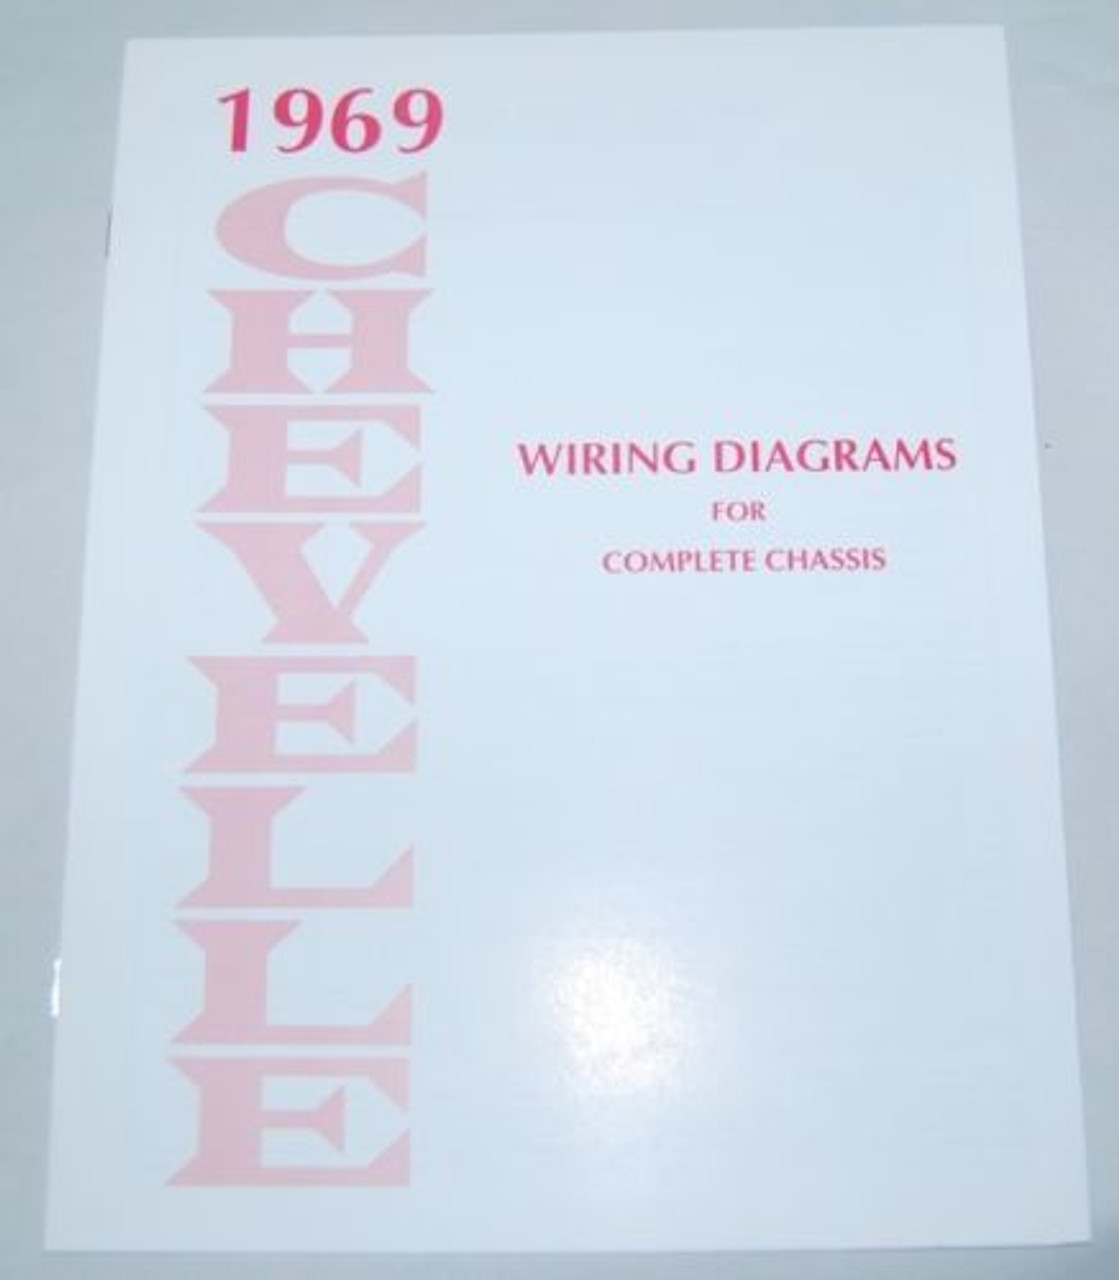 69 1969 Chevelle El Camino Electrical Wiring Diagram